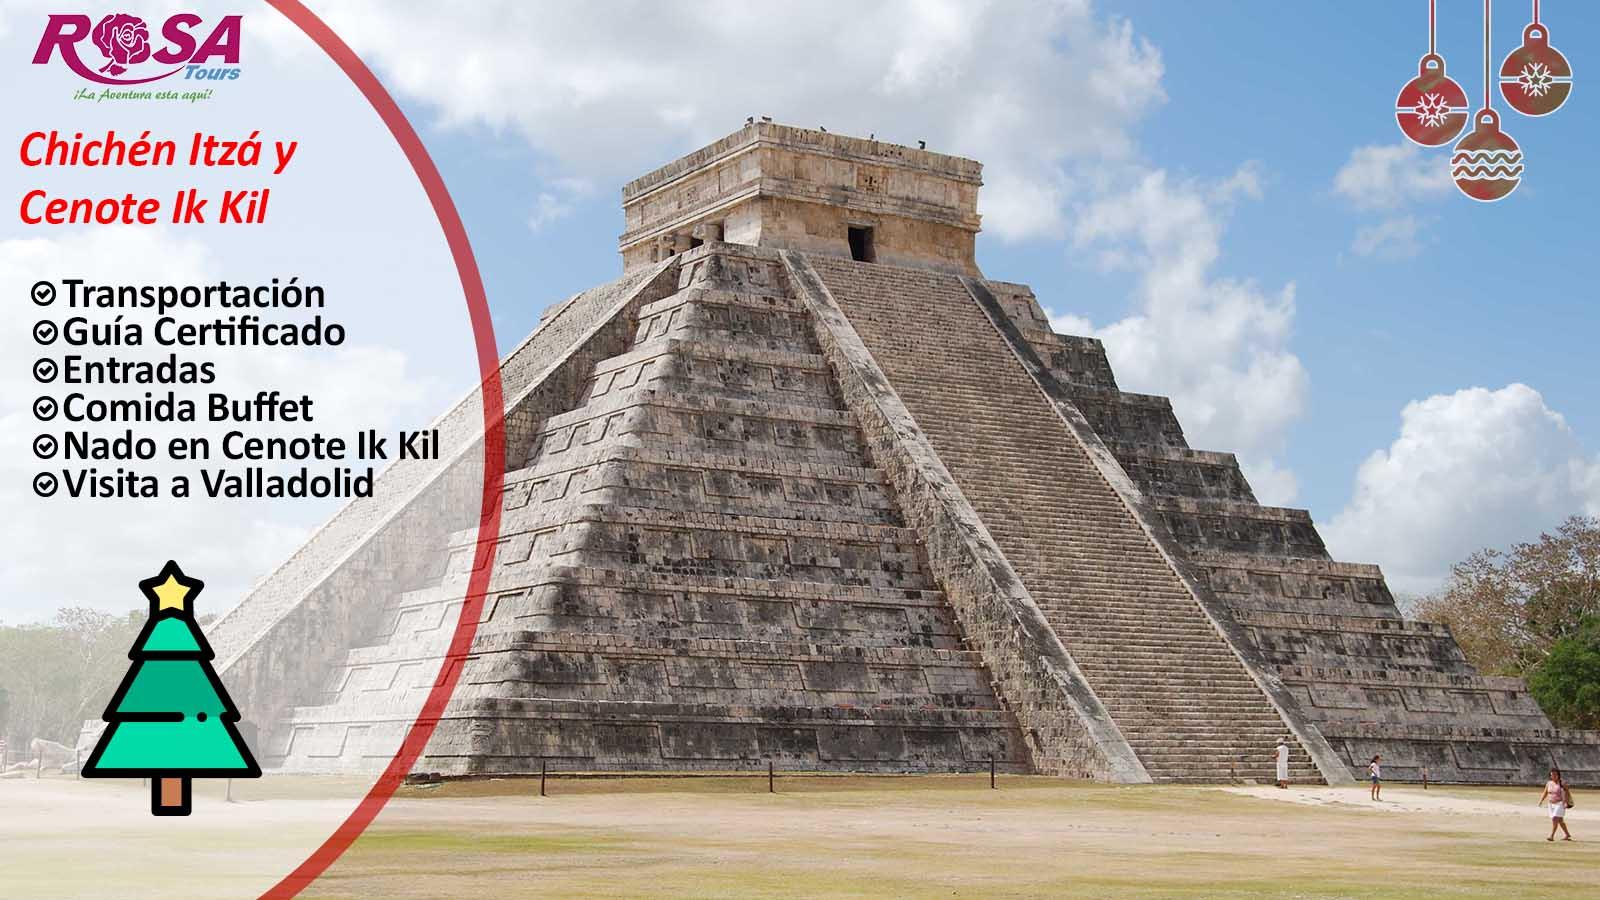 Chichen Itzá Tour con cenote Ik Kil desde Playa del Carmen&IN